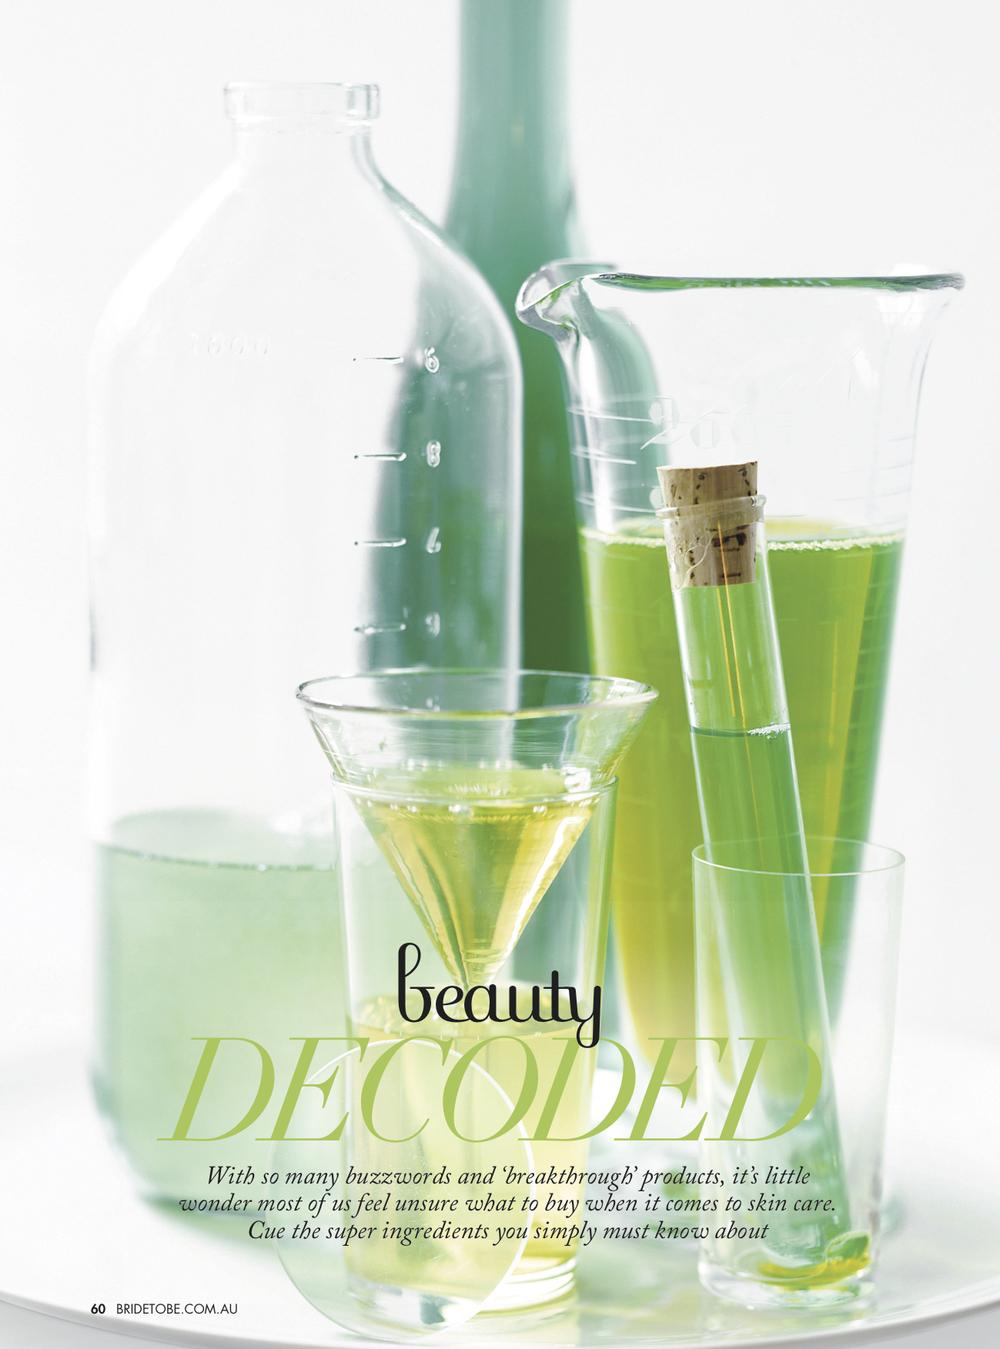 Beauty decoded_1.jpg